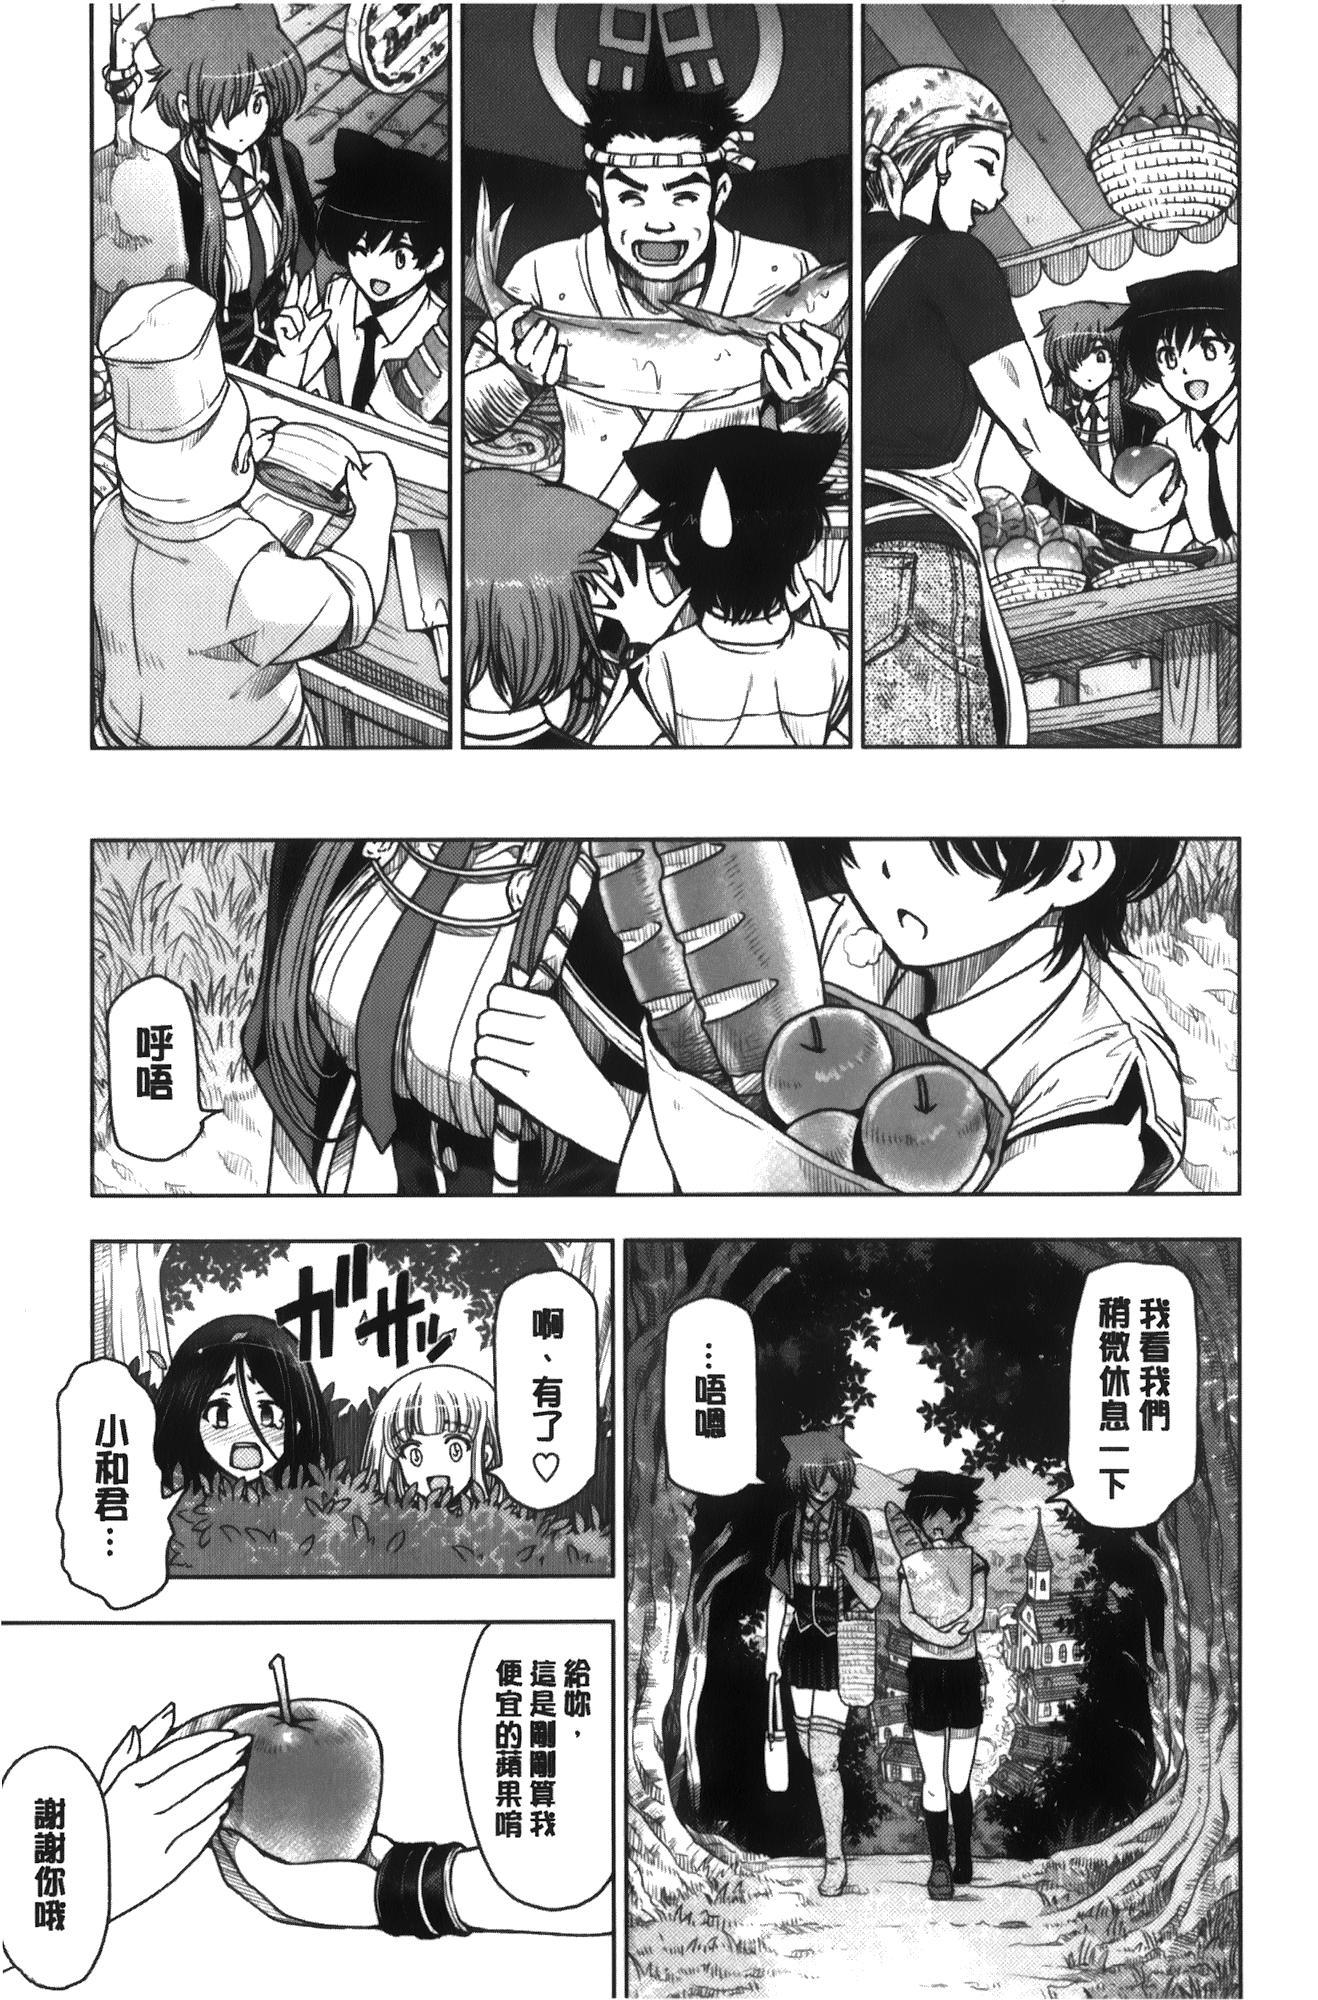 Majo × Shota ~ Genteiban | 魔女X小正太 限定版 179